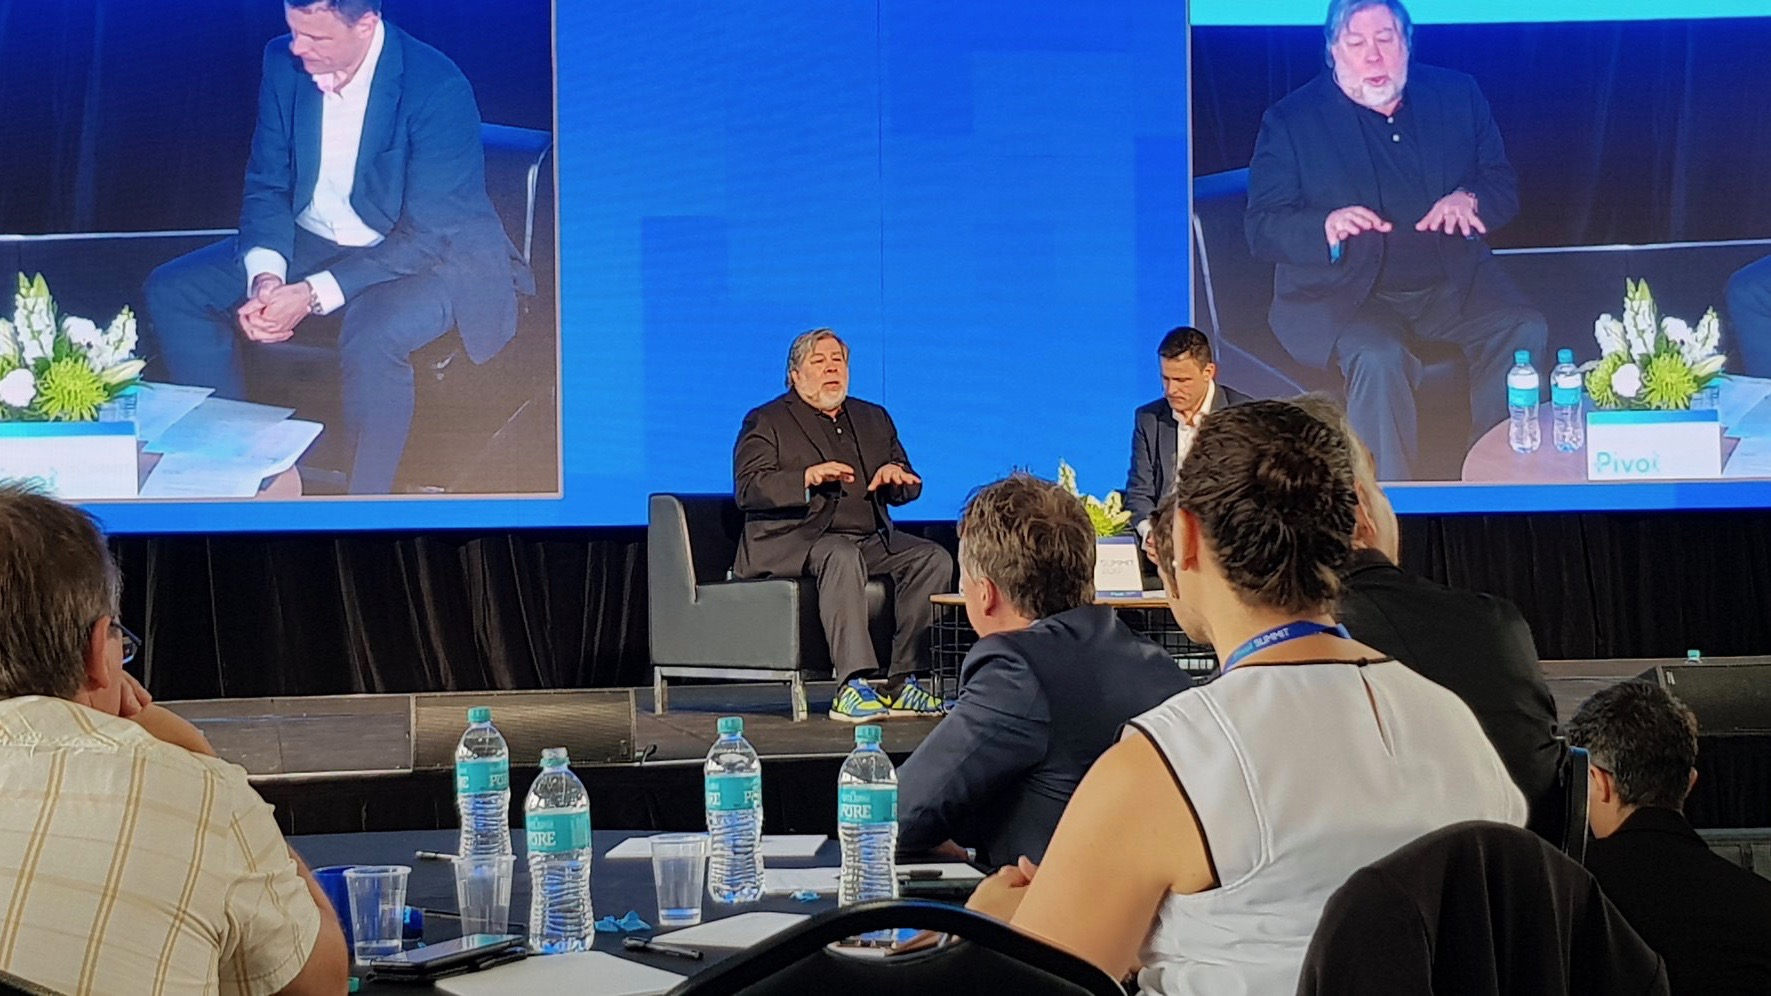 Steve Wozniak says Tim Cook sent him an iPhone X, compares Steve Jobs to Elon Musk in new interview